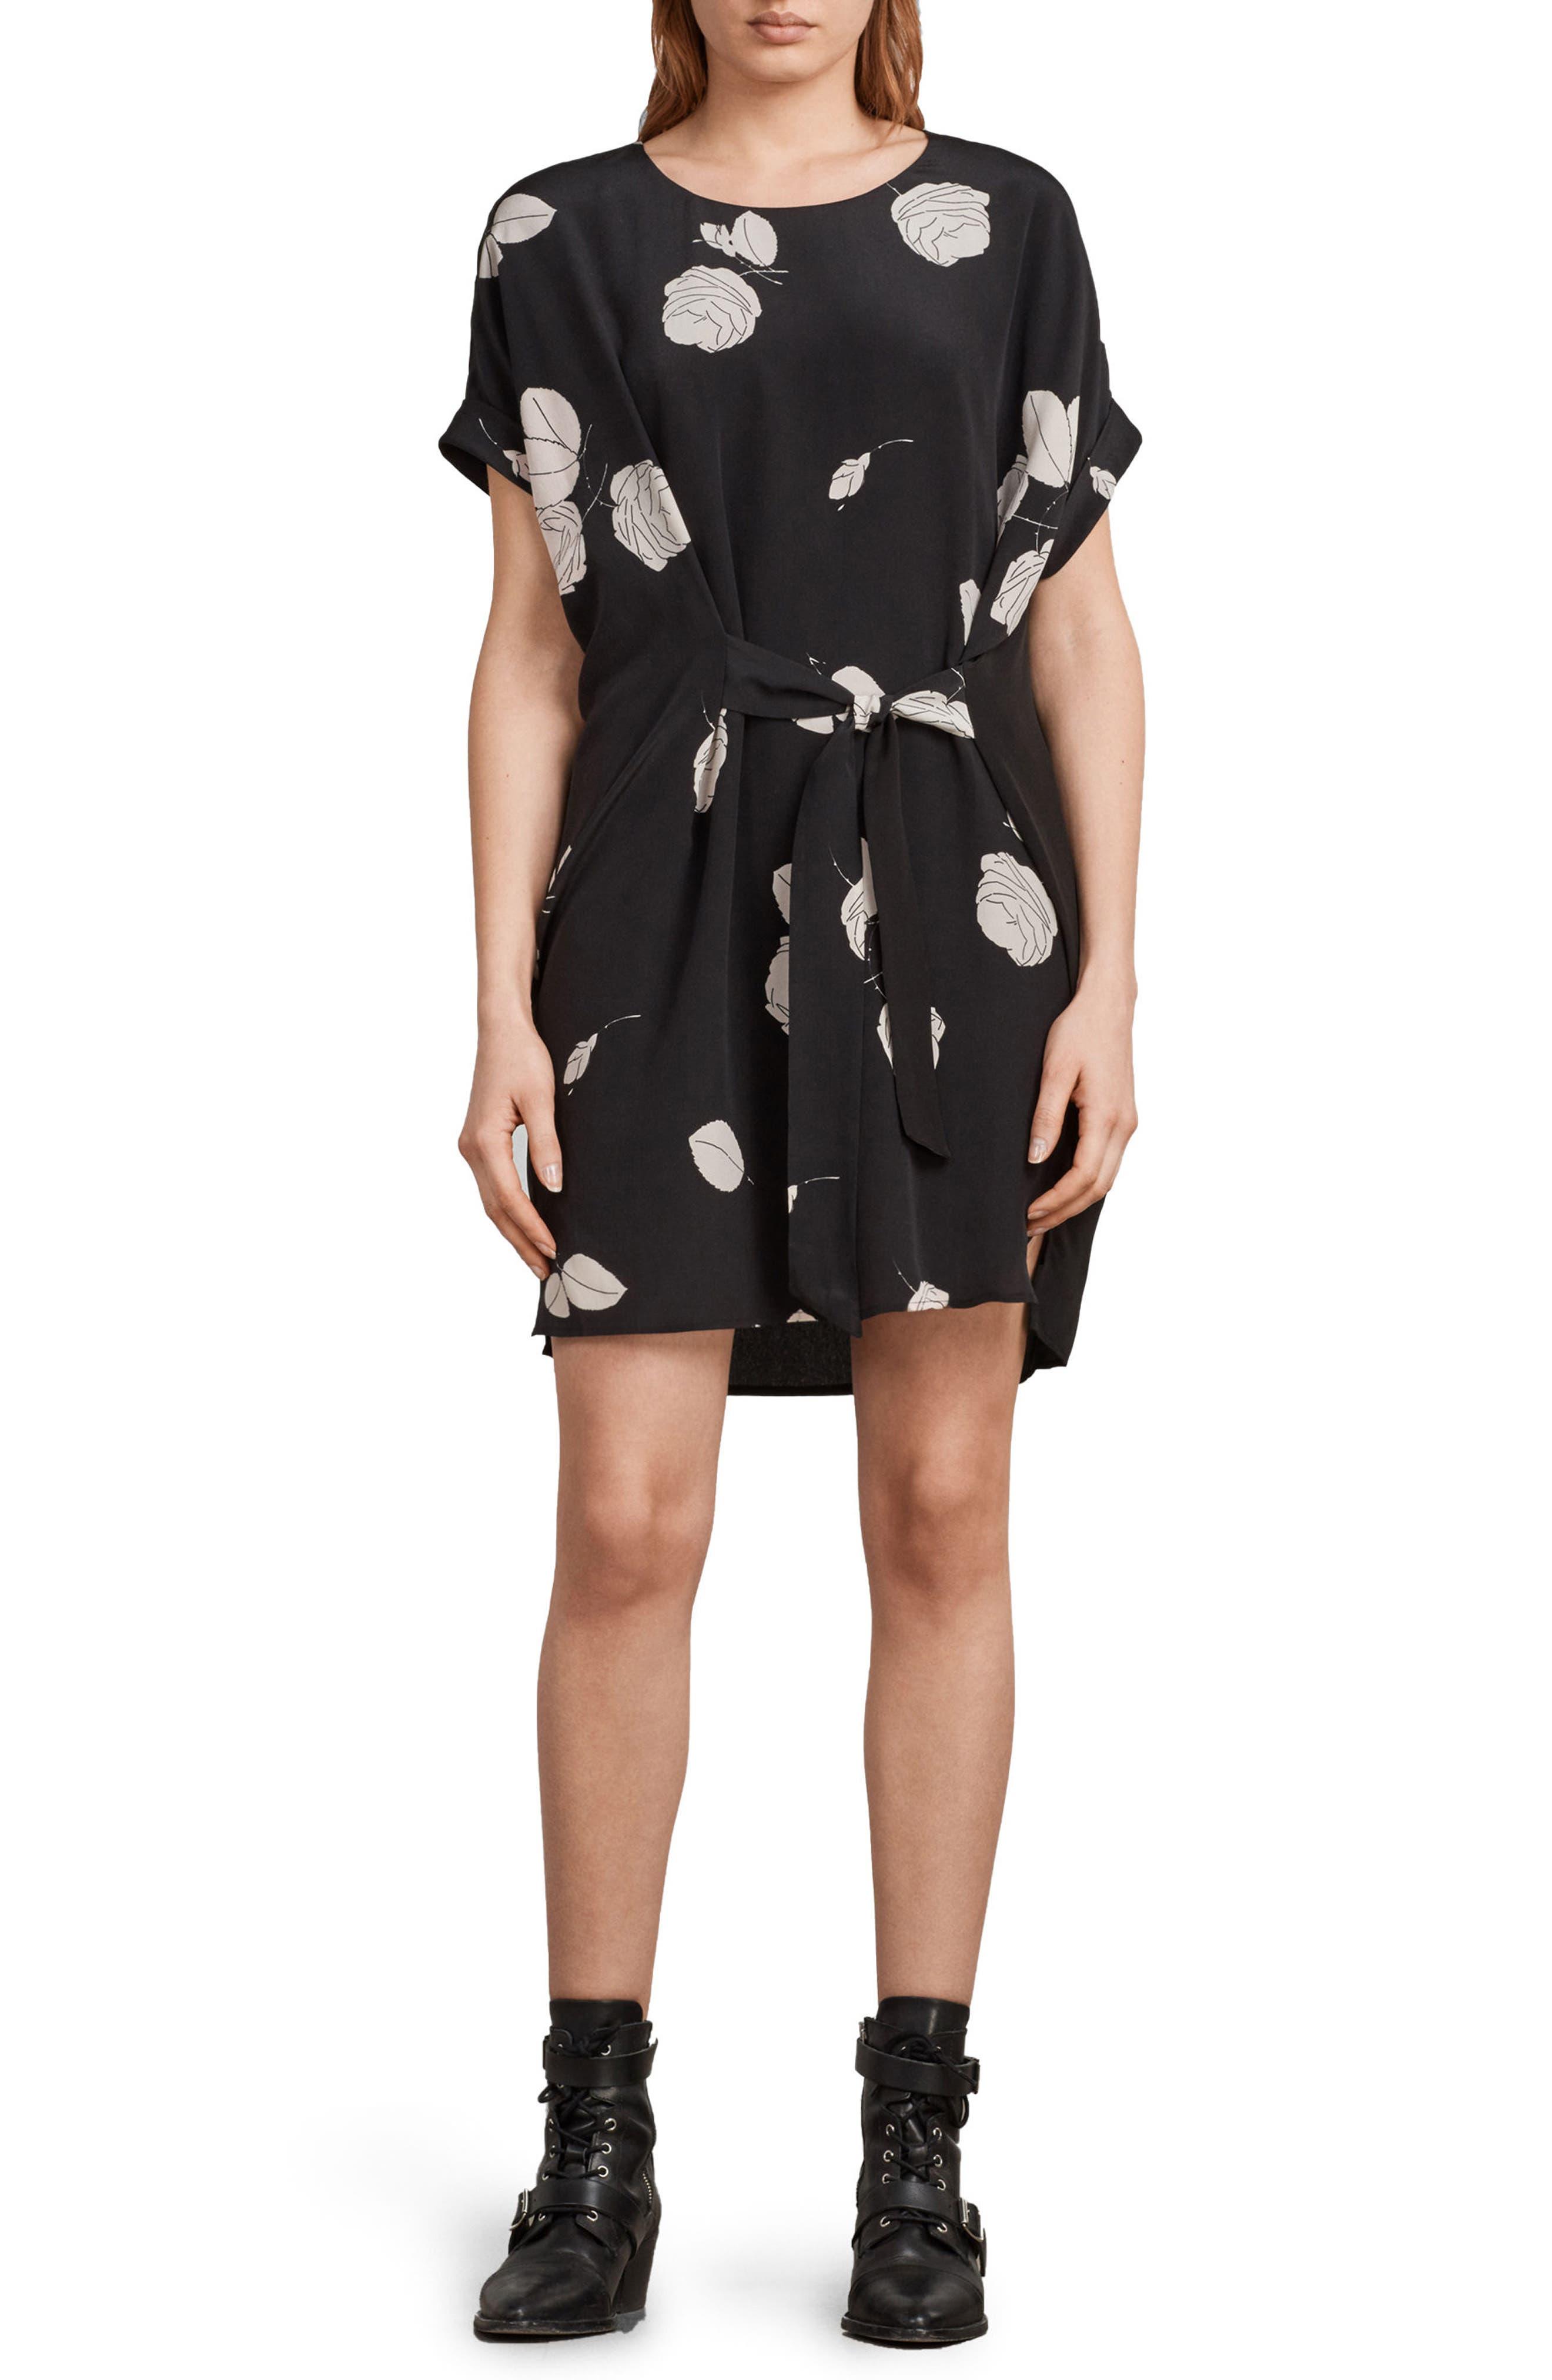 Sonny Rodin Silk Dress,                             Main thumbnail 1, color,                             001